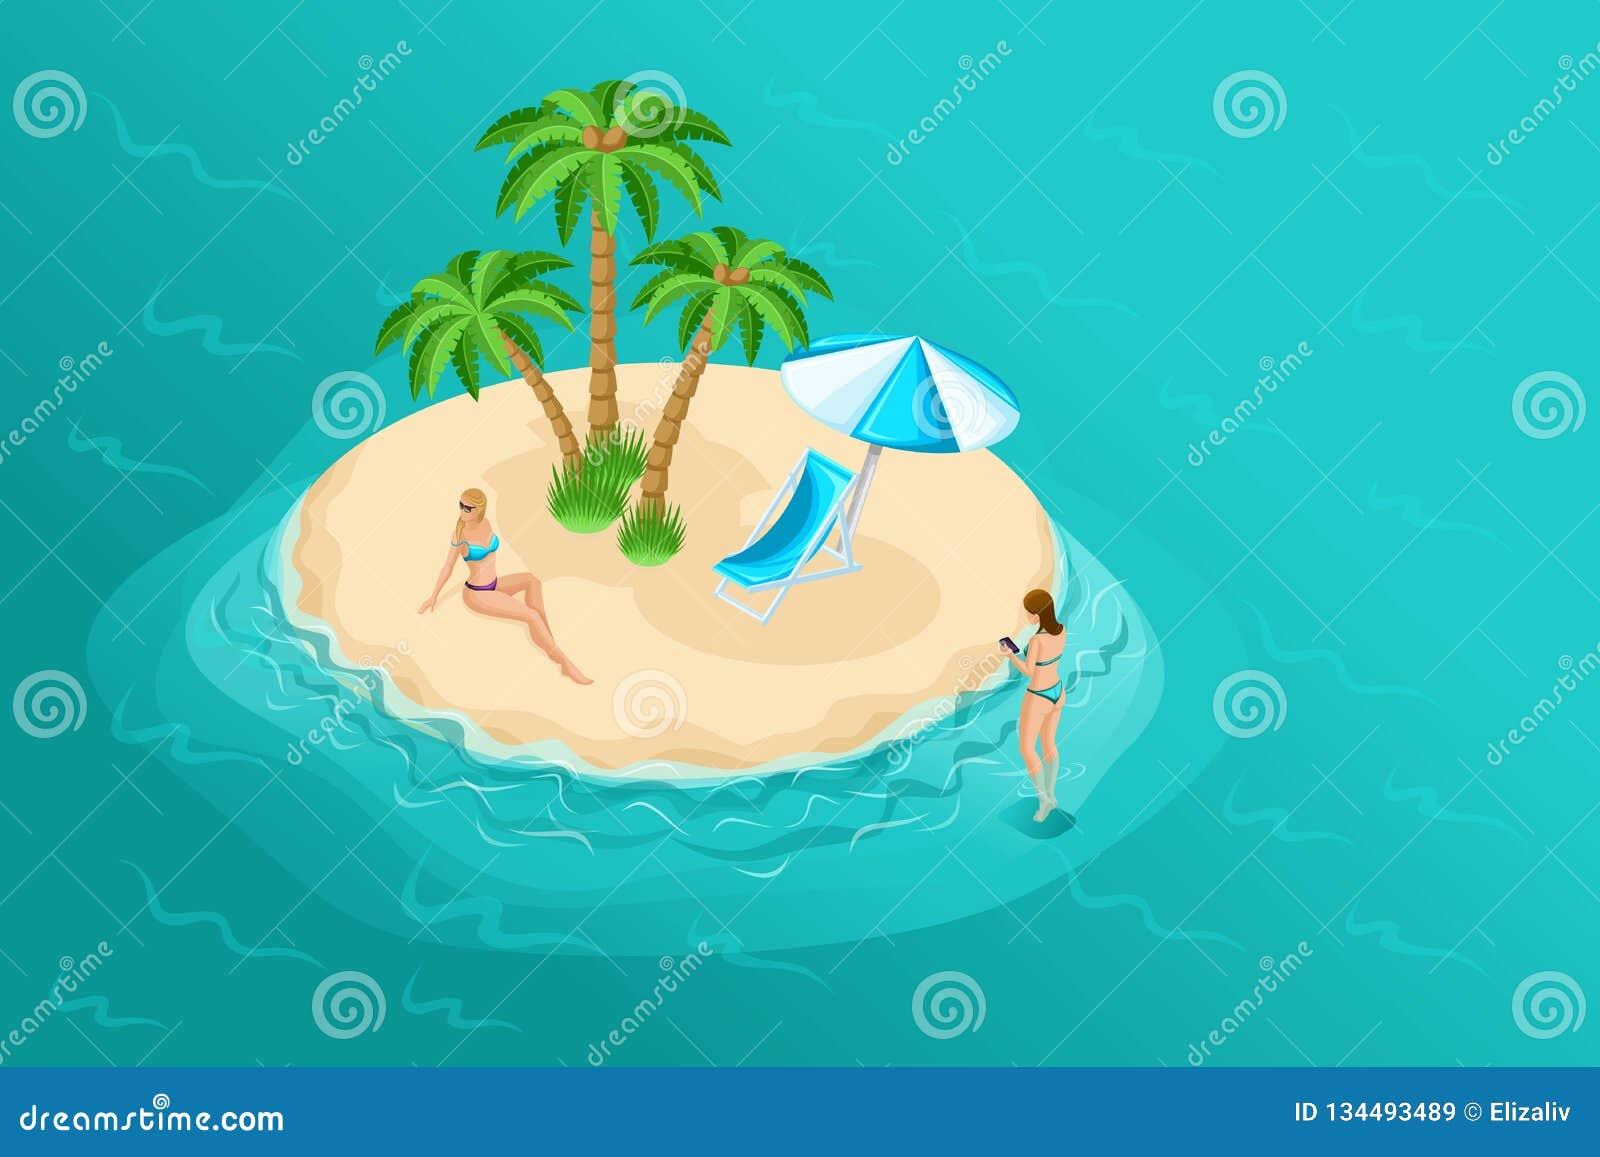 Isometric διανυσματικοί άνθρωποι κινούμενων σχεδίων, τρισδιάστατο κορίτσι σε ένα κοστούμι λουσίματος σε ένα νησί ερήμων στα μέσα